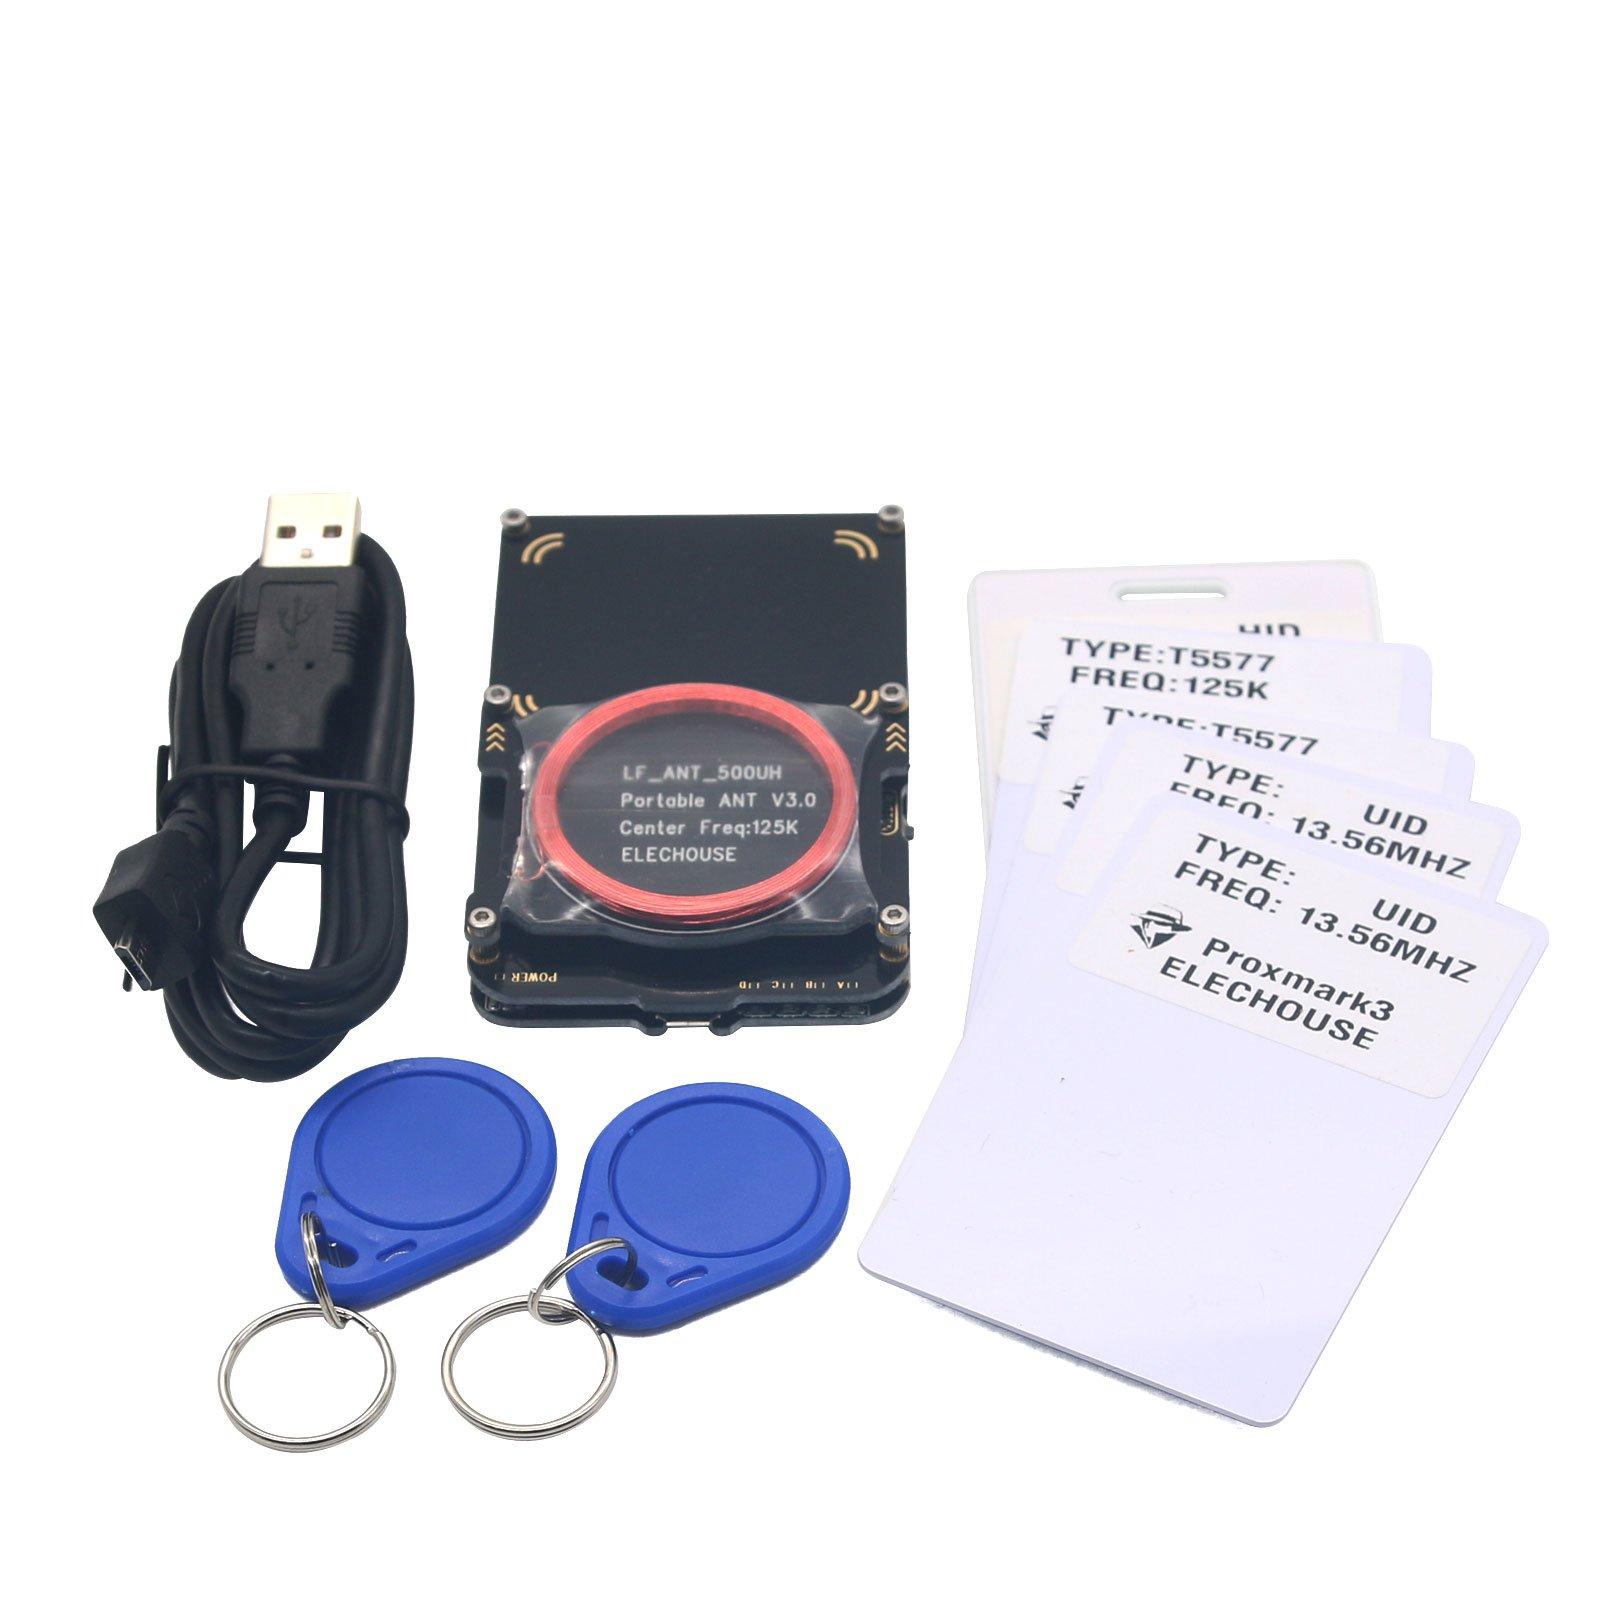 Proxmark3 ProxmarkIII 3.0 Kits for RFID H/ID UID Clone by HKCNMA